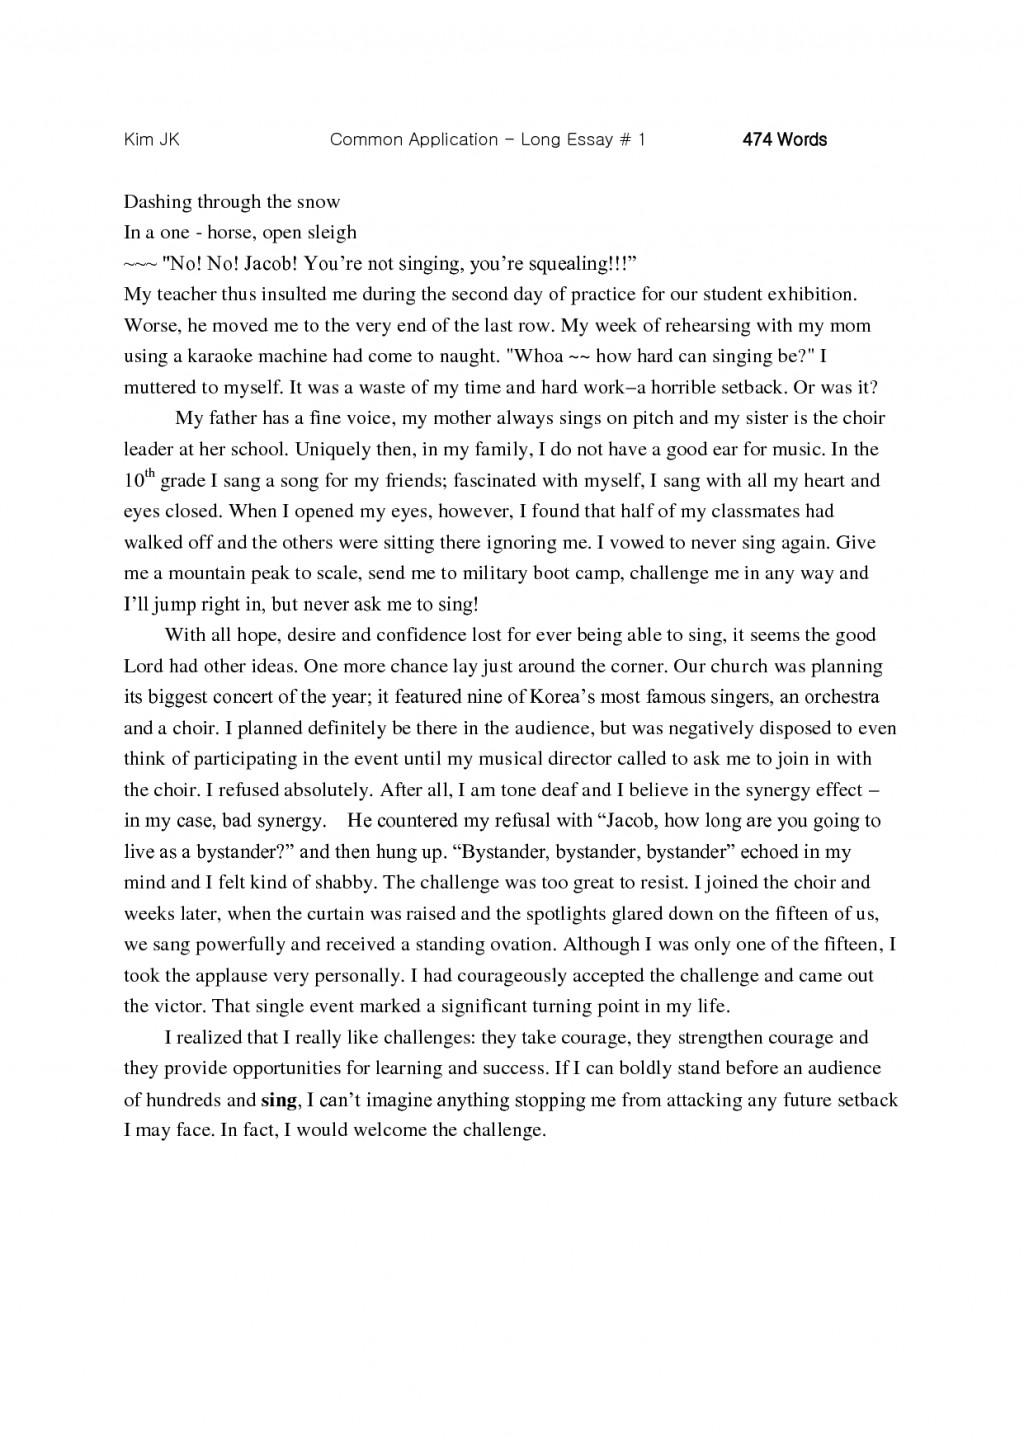 005 Good Common App Essays Resume Writing Application Essay Help Cnessayjuvi Example Unusual Prompt 1 Examples 3 4 Large